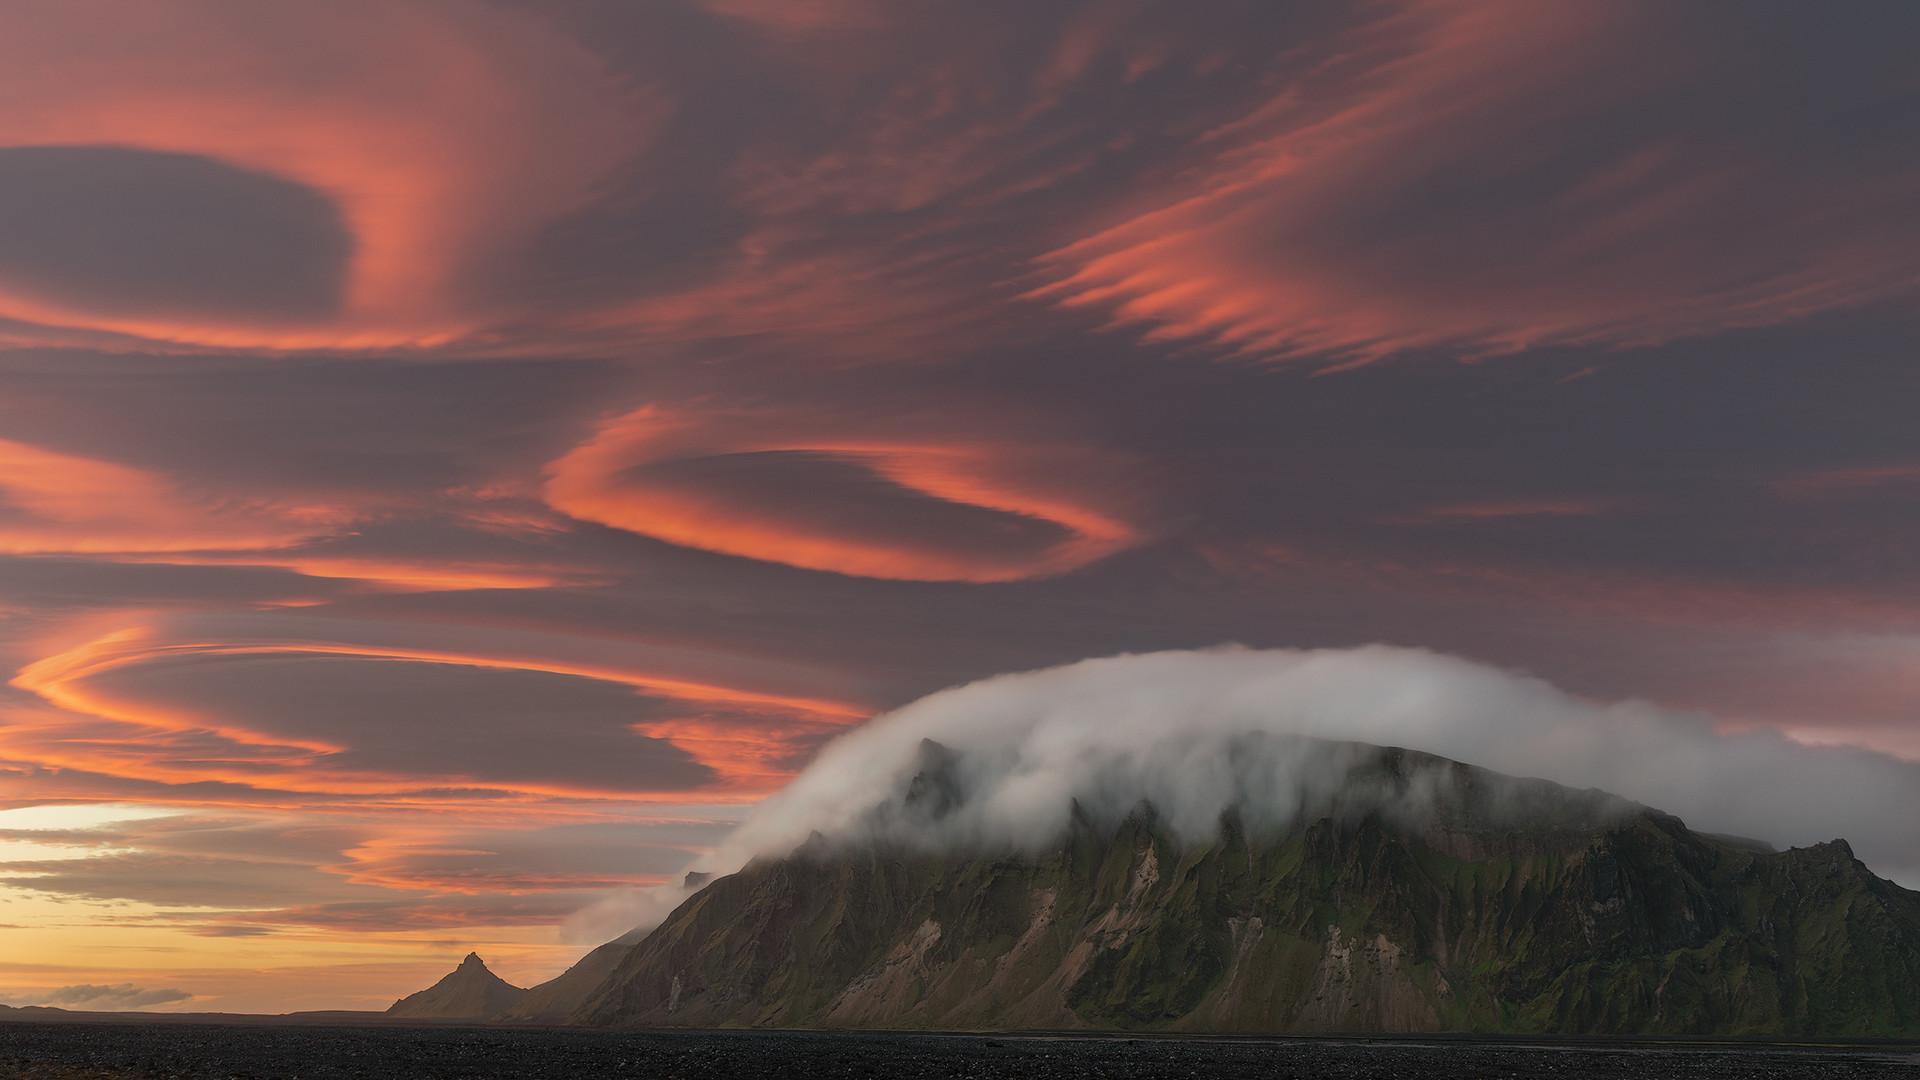 lenticular-sunset-copy.jpg